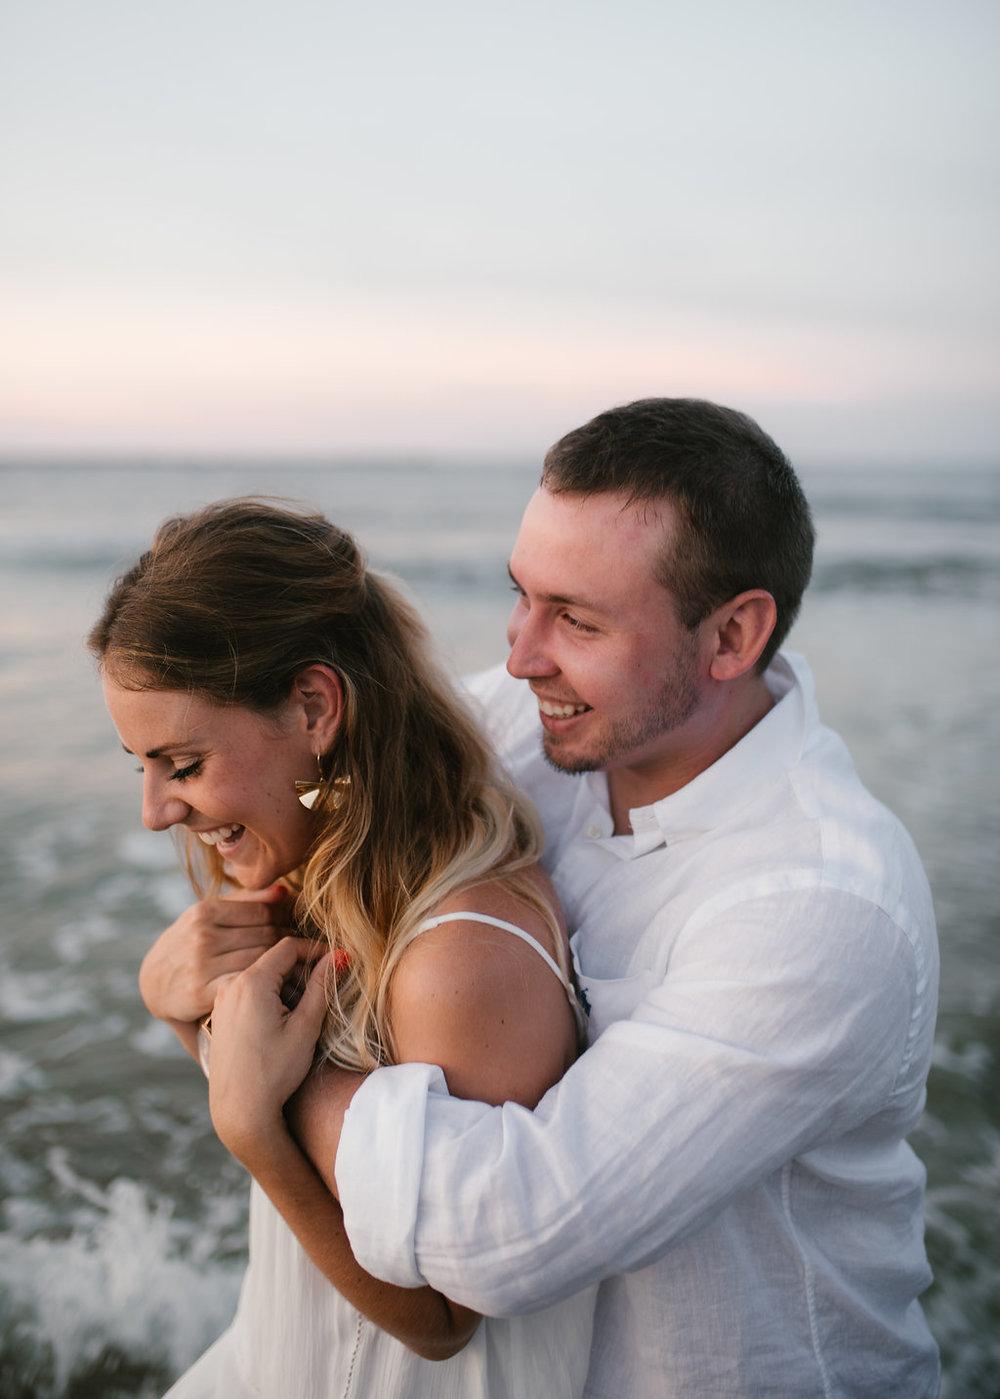 Morgan-Jordan-New-Smyrna-Beach-Engagement-165.jpg